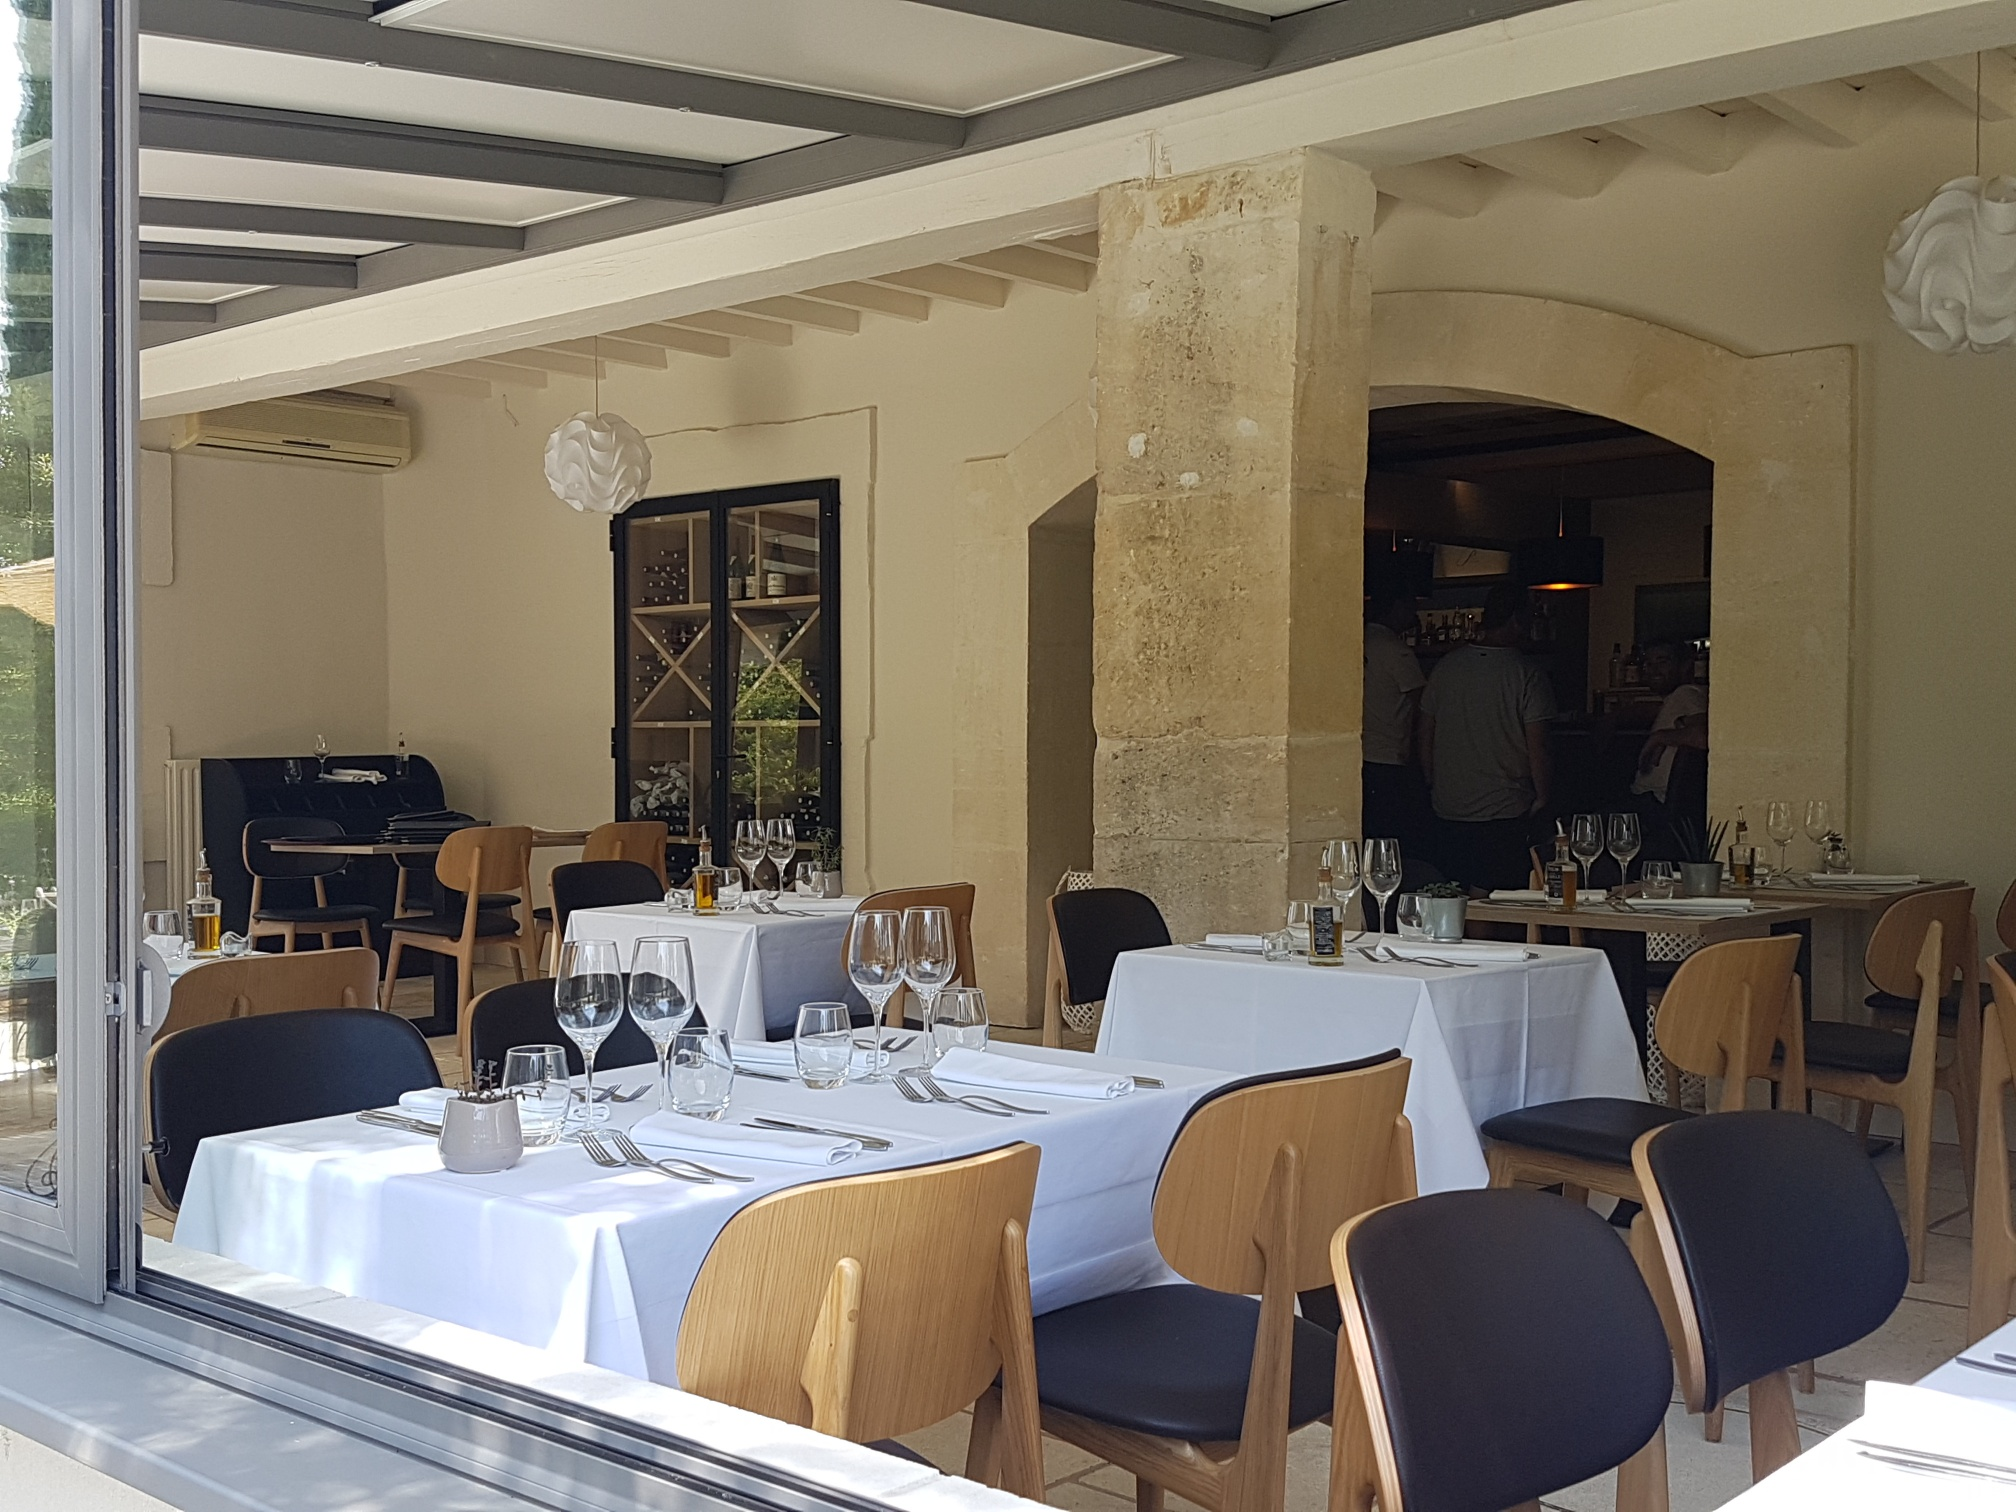 Déjeuner en terrasse - Hotel 3 étoiles Provence